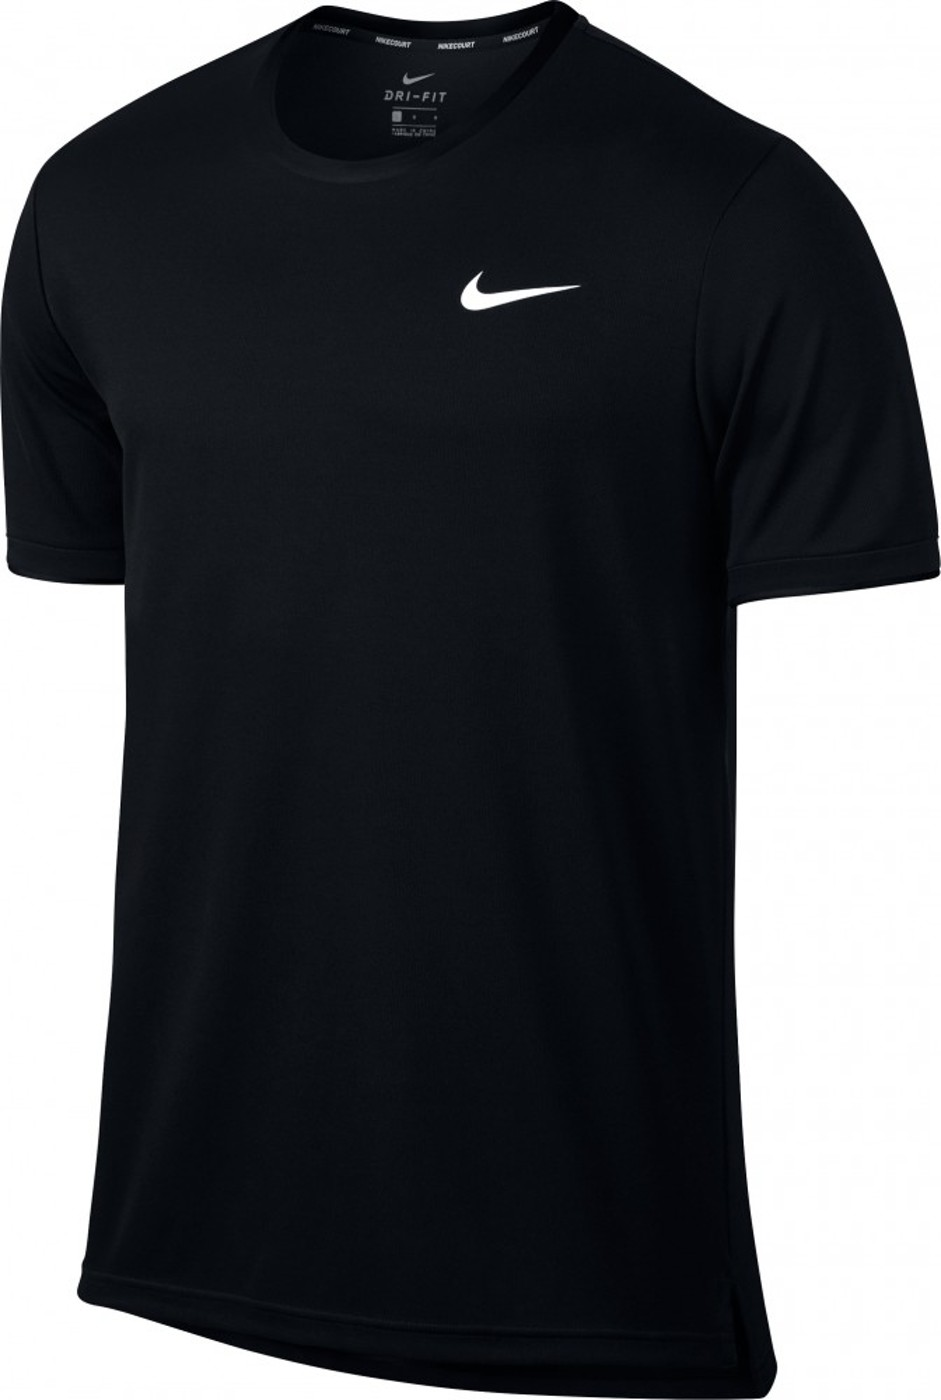 NIKE Shirt TEAM - Herren